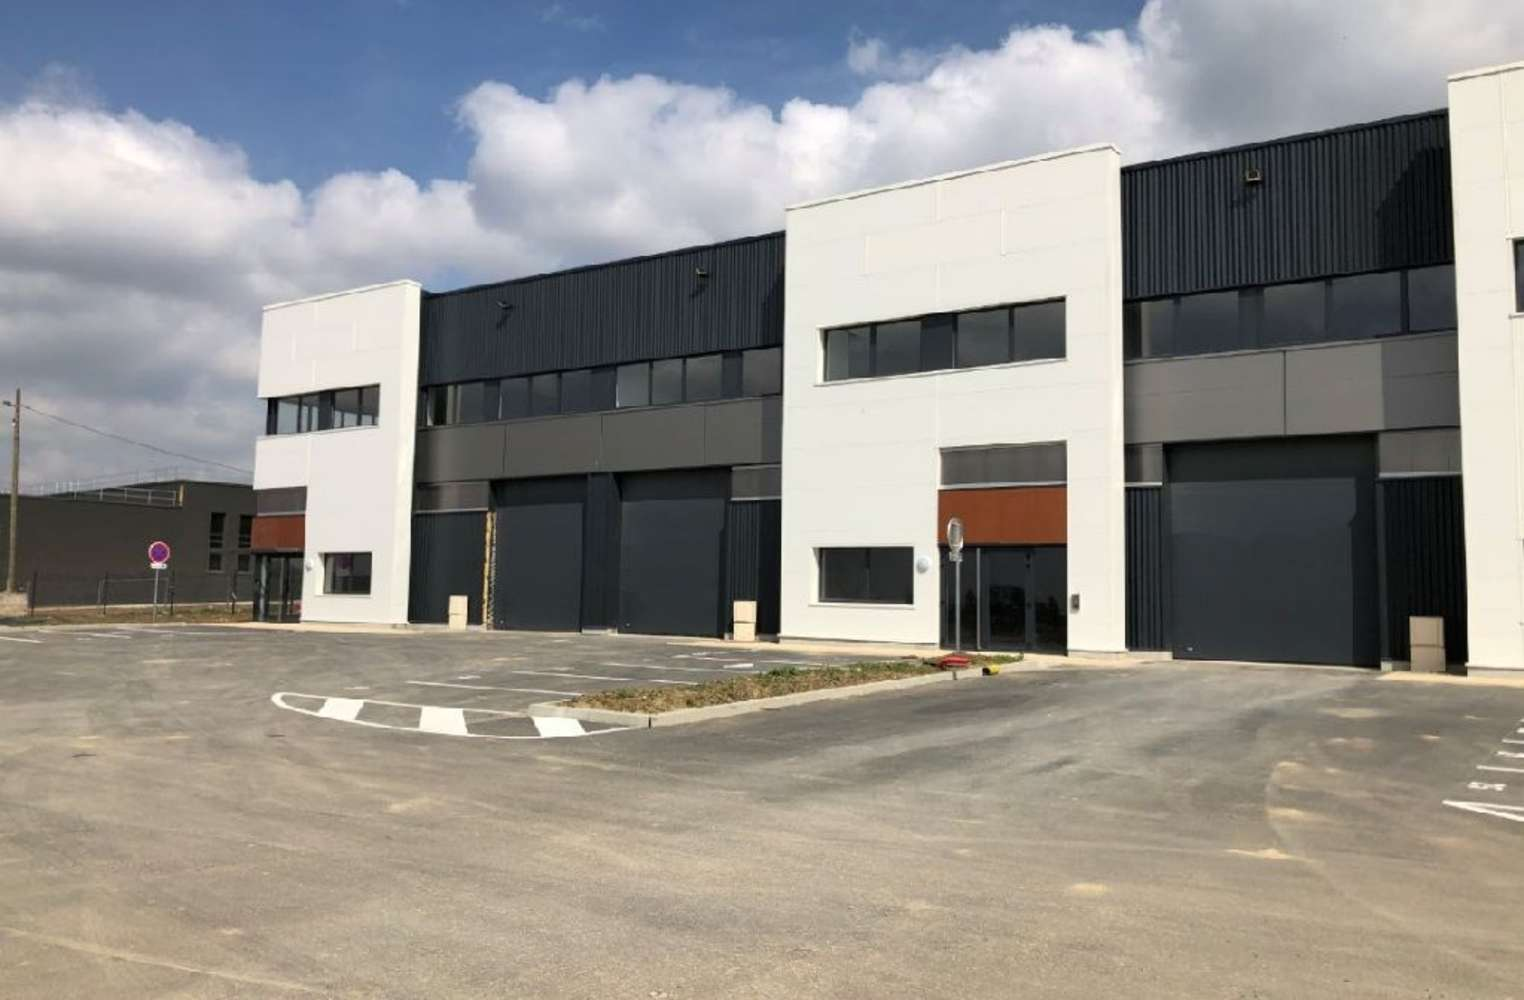 Activités/entrepôt Groslay, 95410 - MONTS DU VAL D'OISE - 10086073